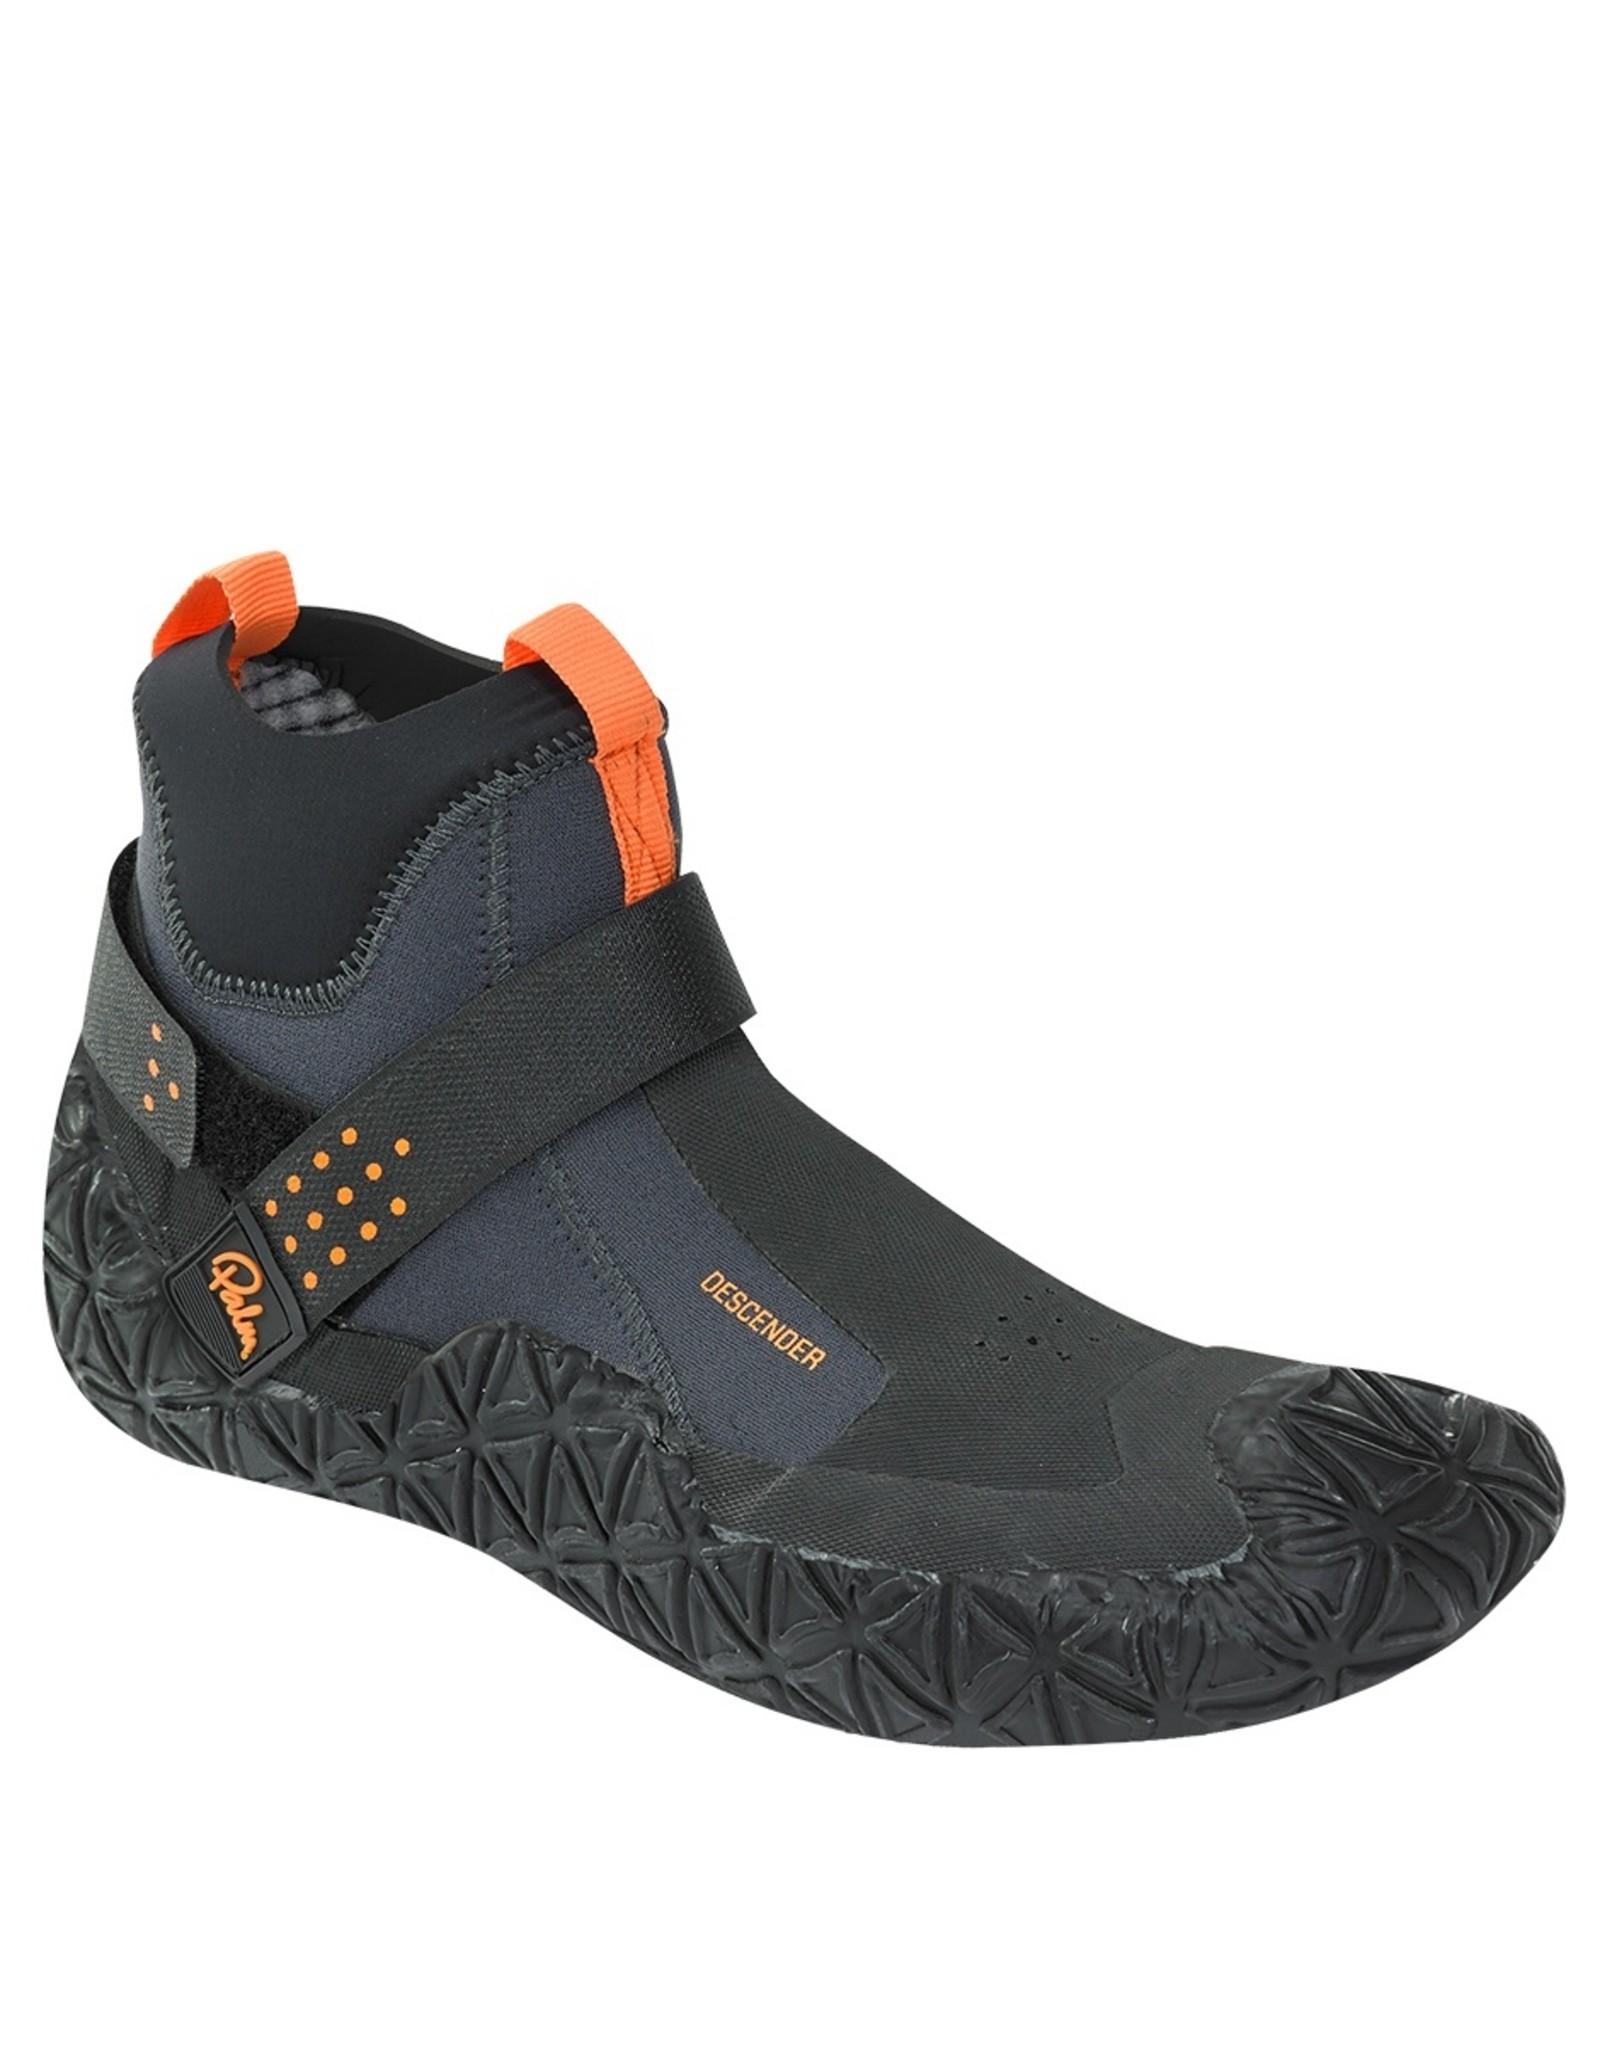 Palm Palm Descender Shoe Jet Grey